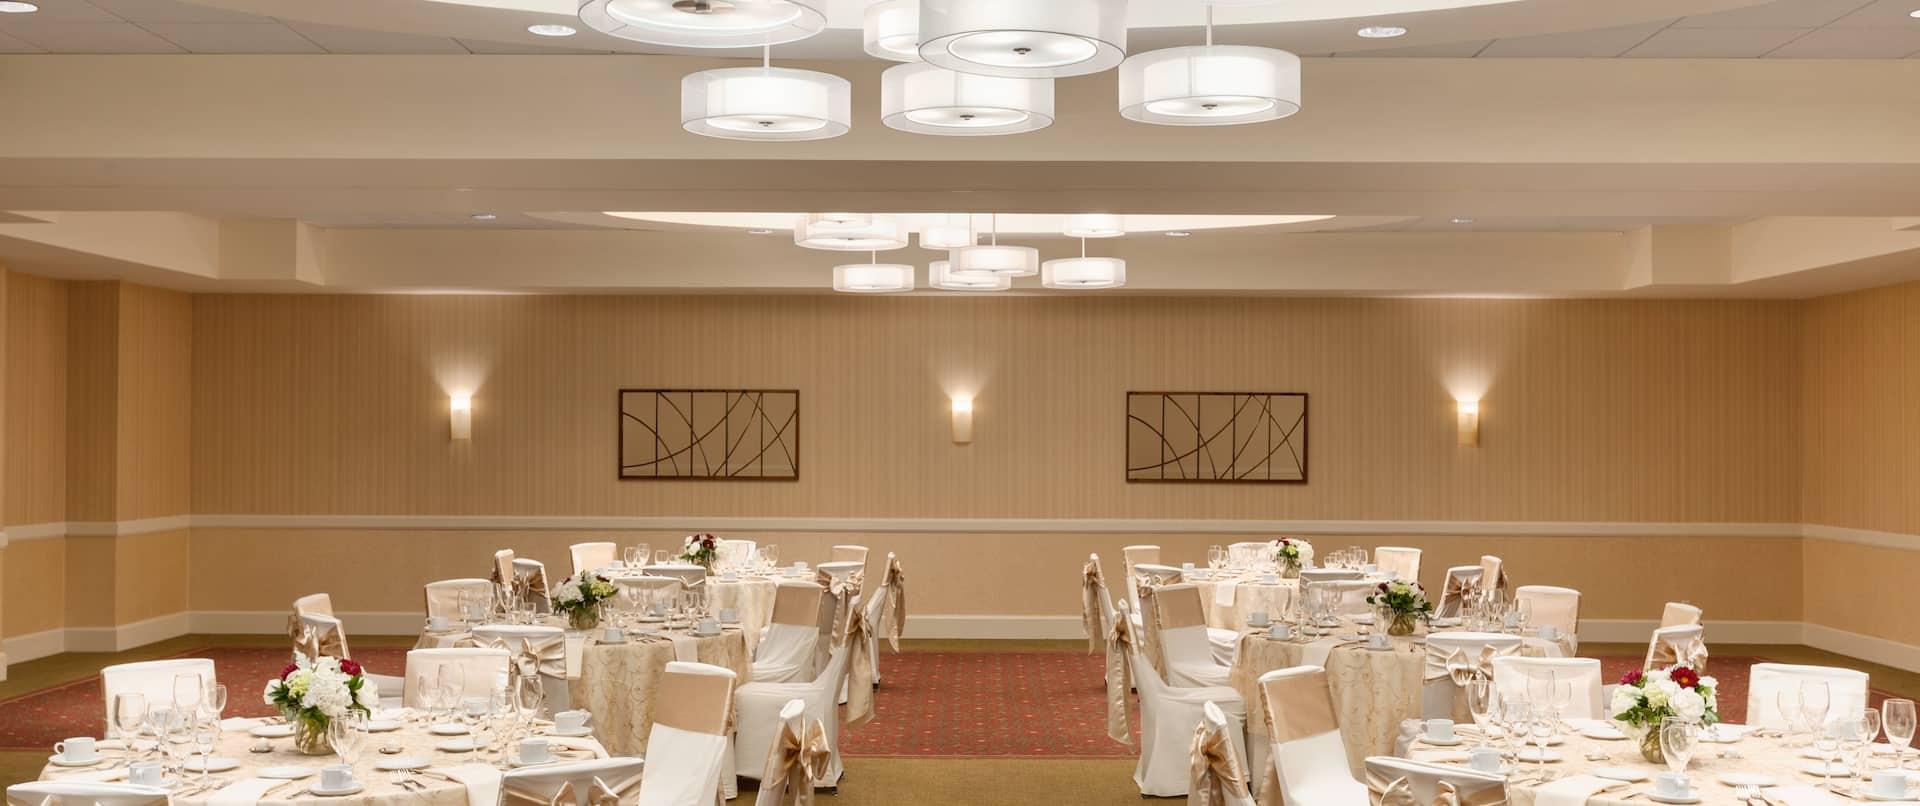 Embassy Suites Boston Waltham - Drake Ballroom